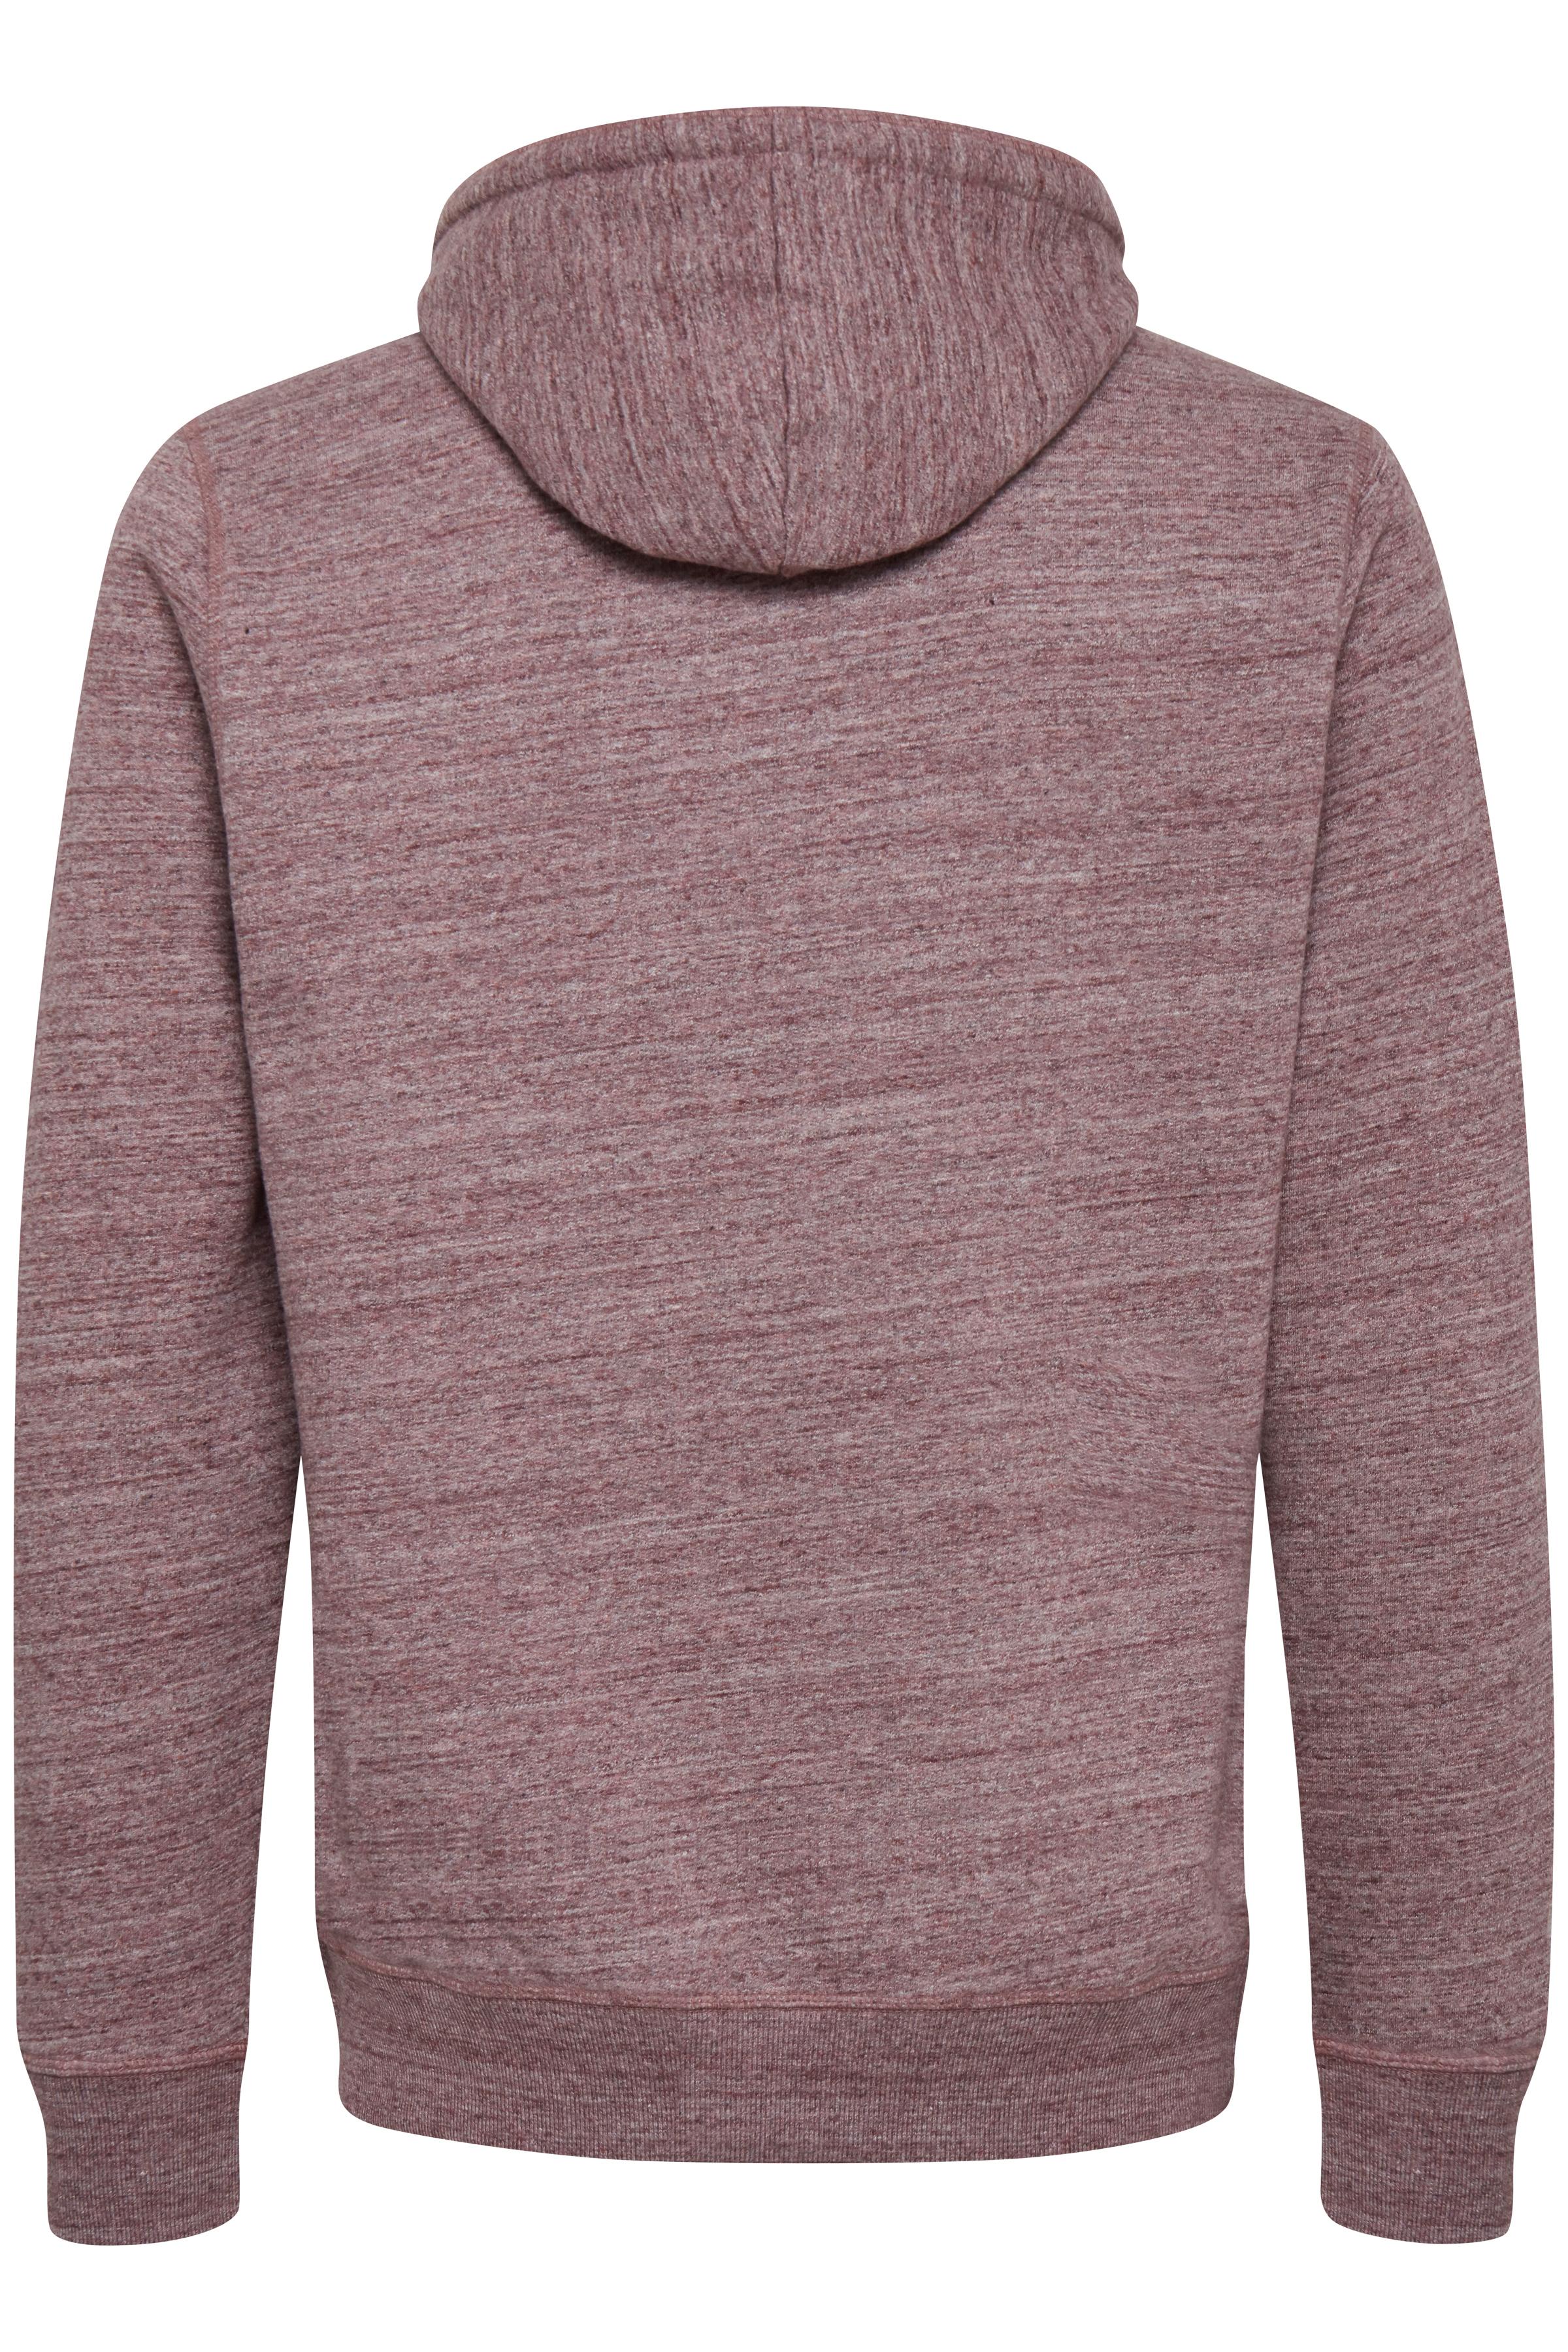 Wine red Hooded blouse fra Blend He – Køb Wine red Hooded blouse fra str. XXL-3XL her